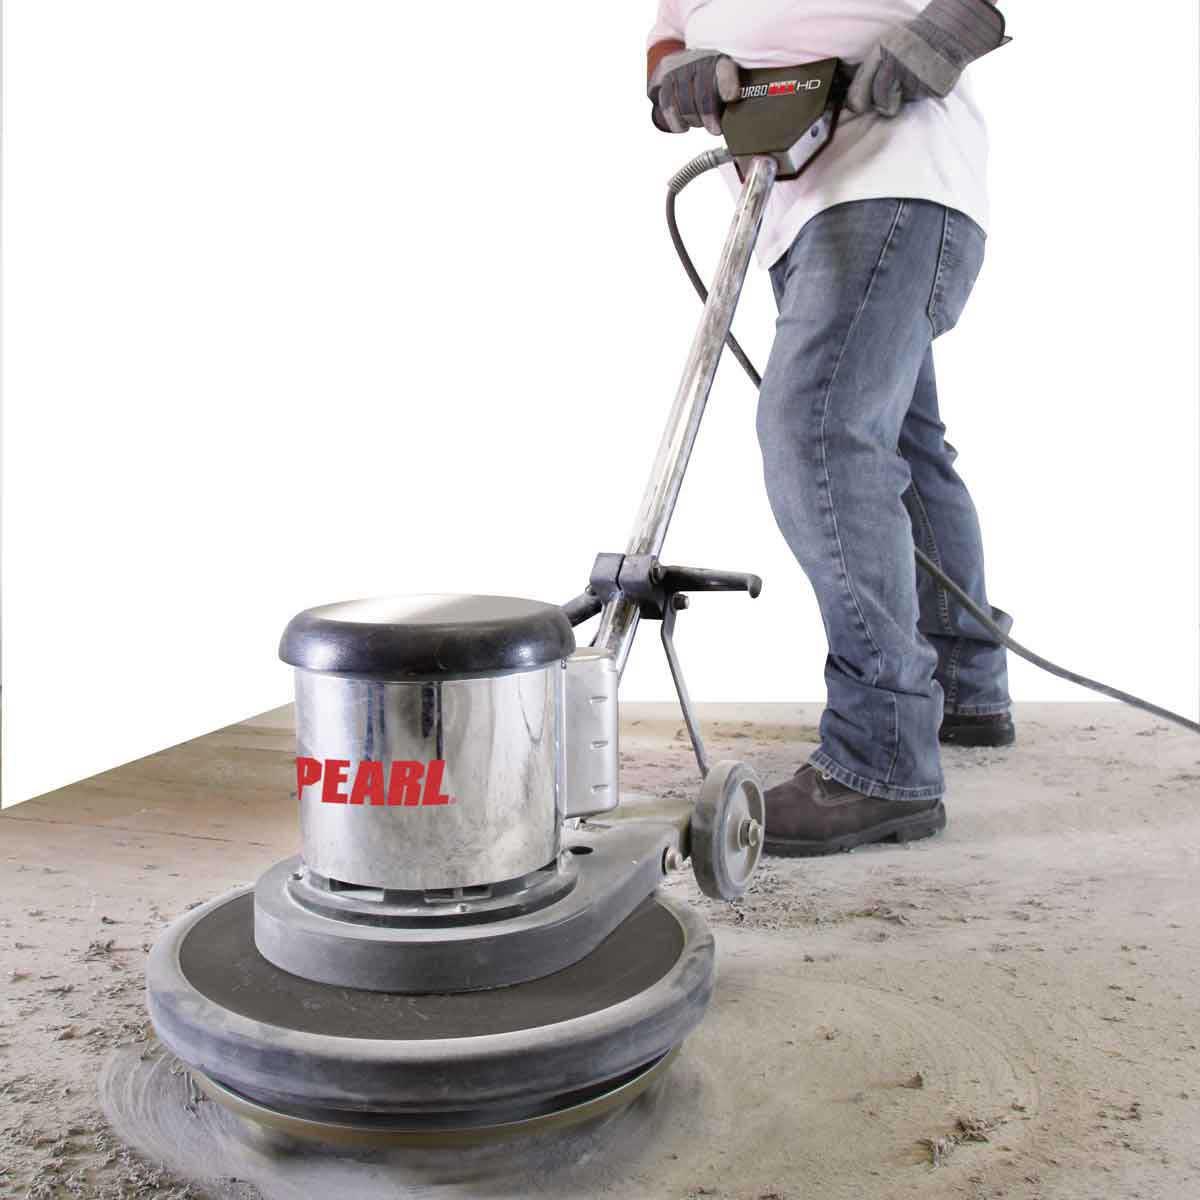 Pearl TurboMax Buffers carpet glue